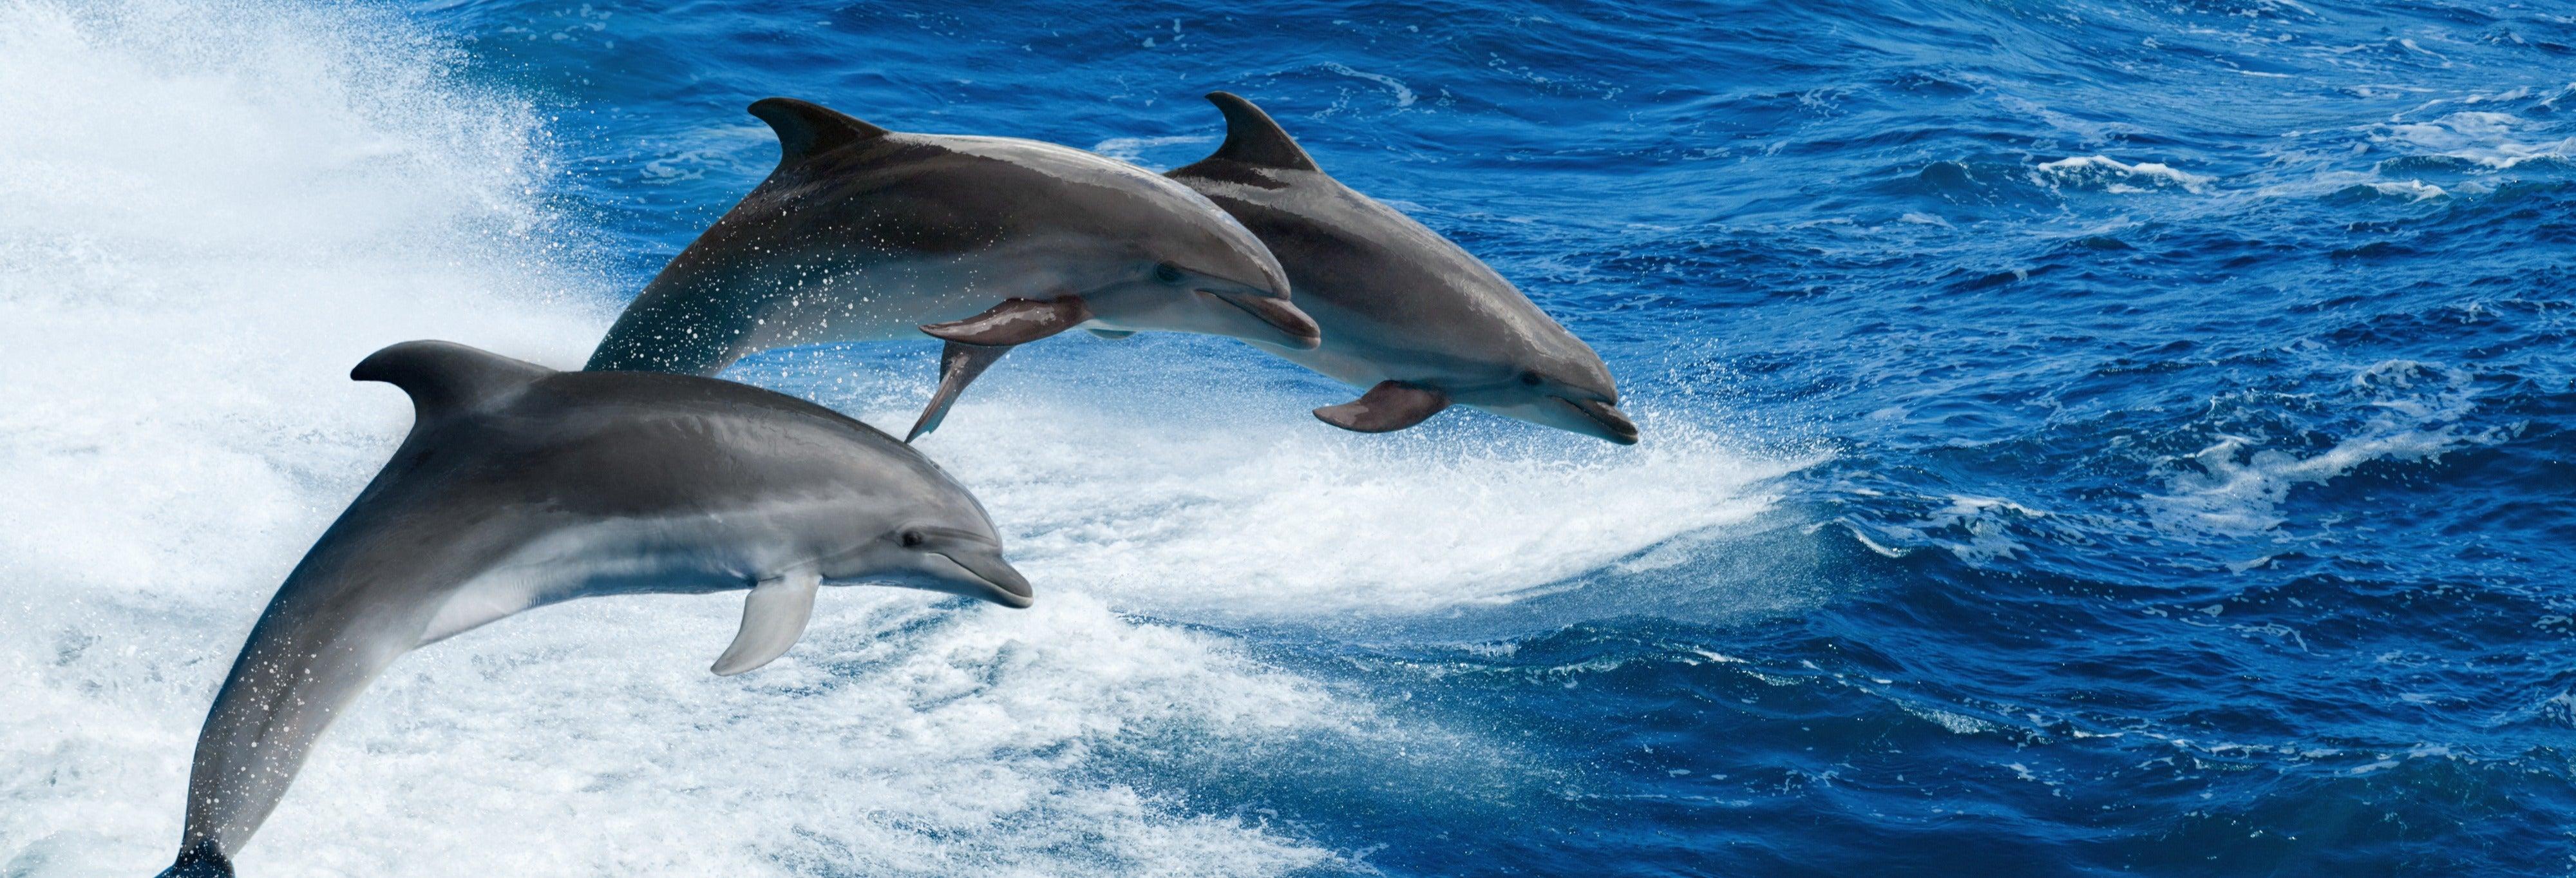 Avistamiento de delfines en Clearwater Beach